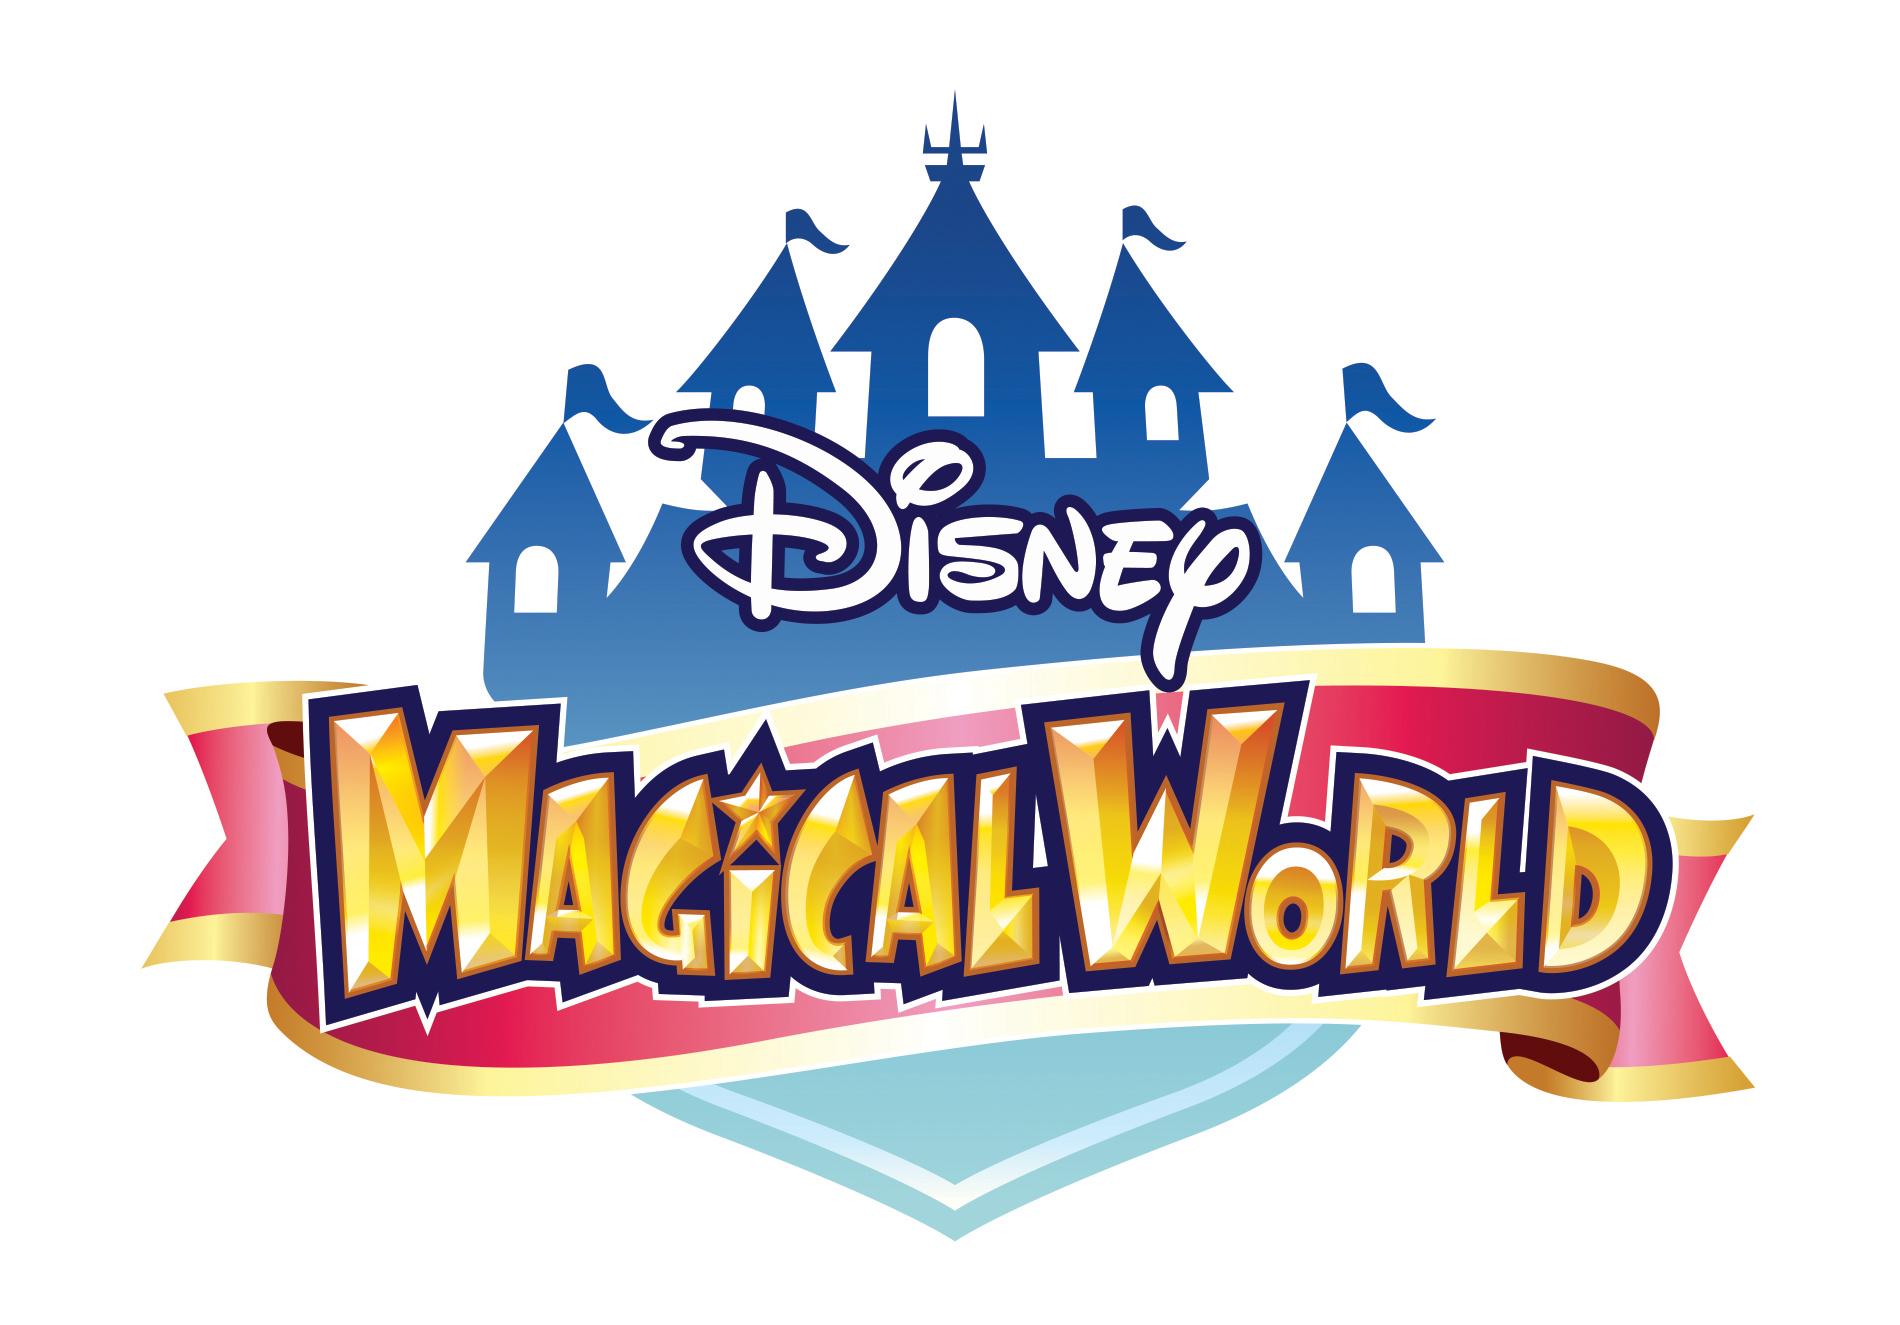 Disney Magical World